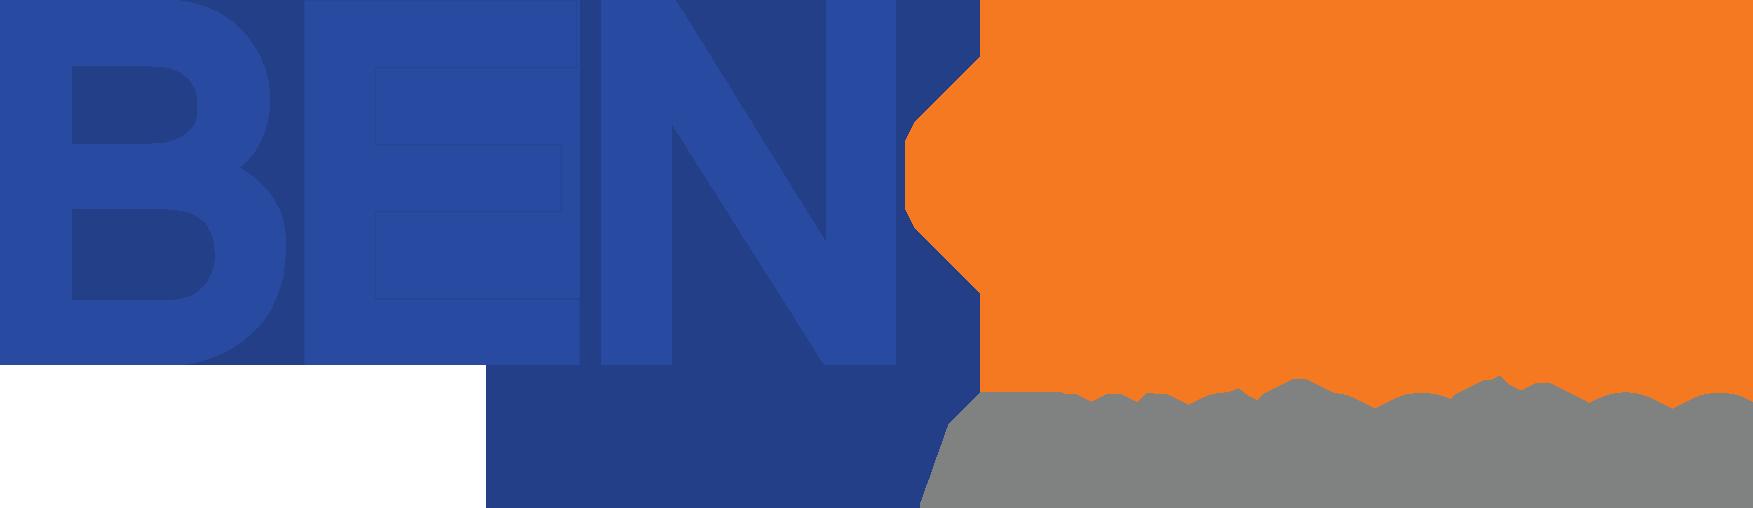 bhw_logo_full_size